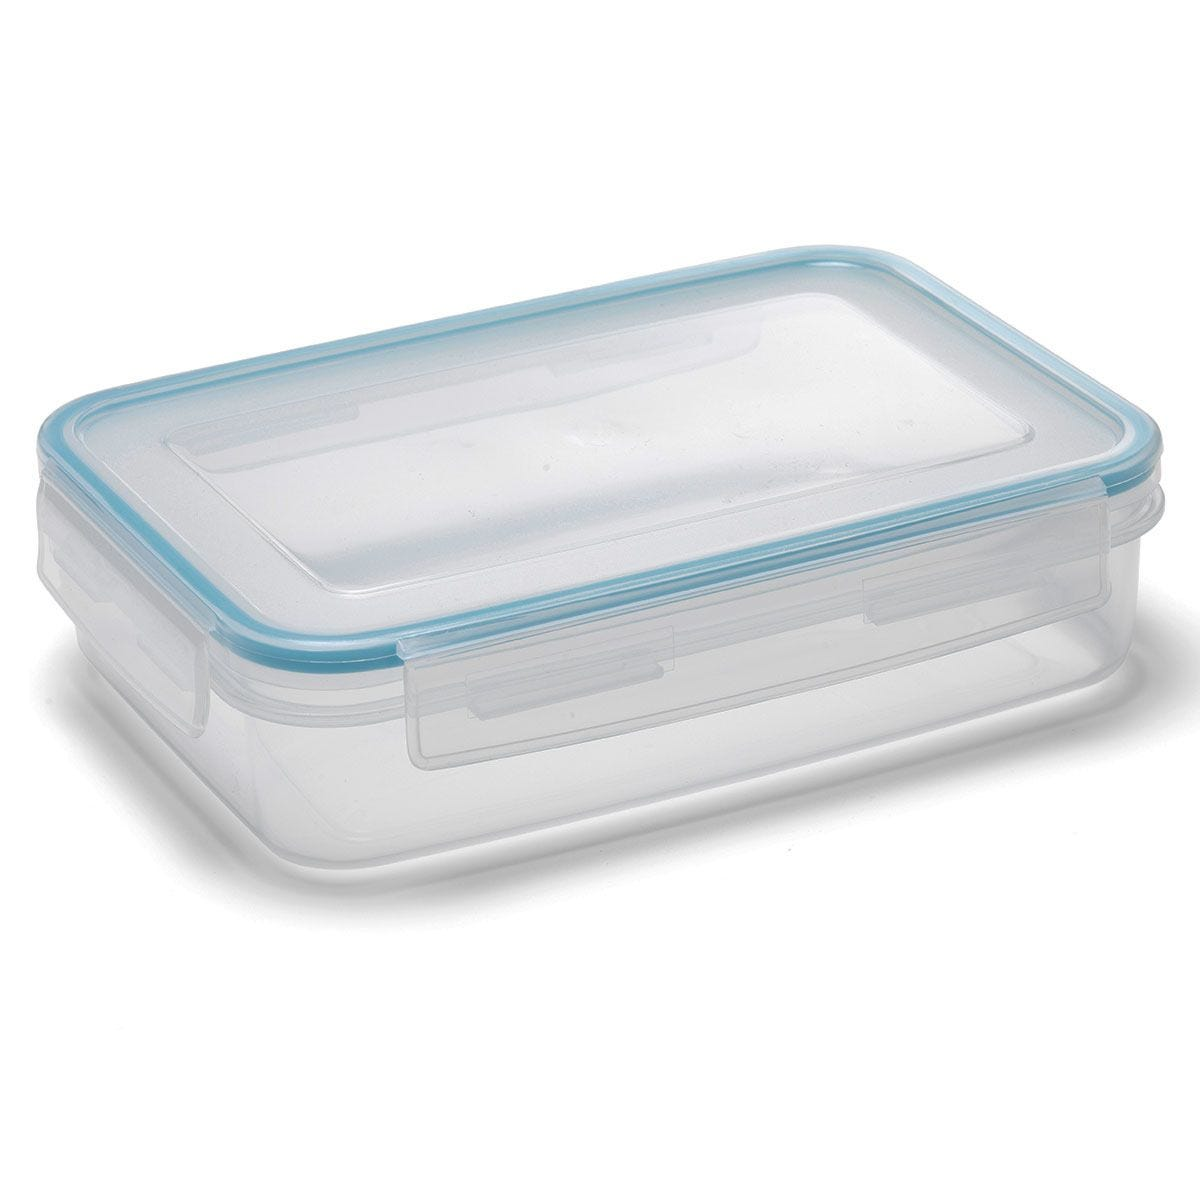 Addis Clip And Close Food Container - 1.1L